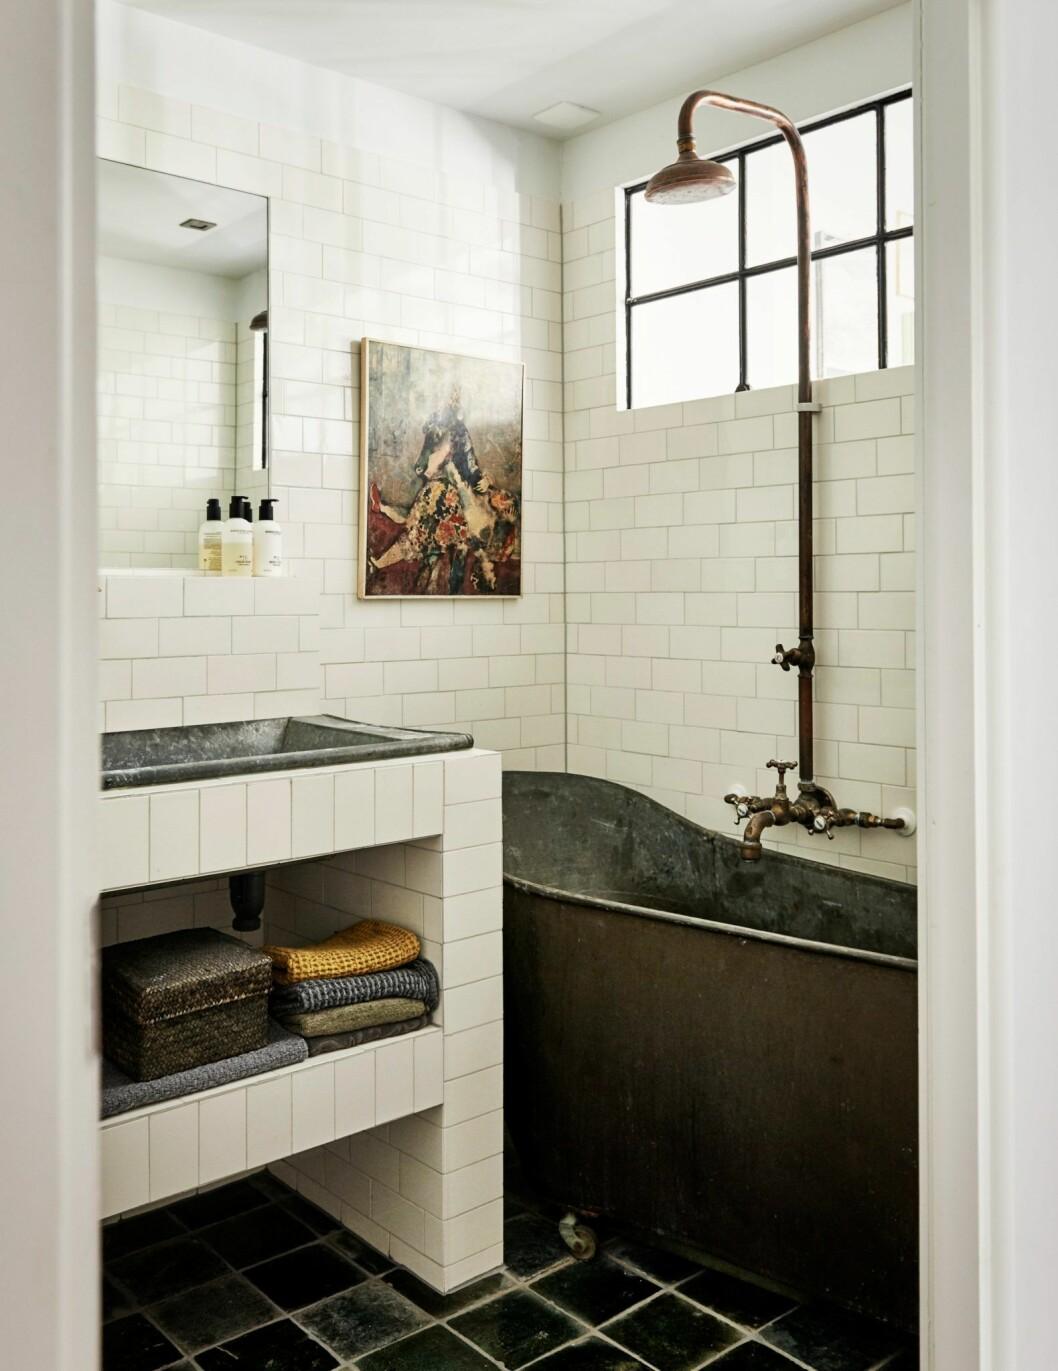 Vitt marmorsbadrum i hemmet i Amsterdam.